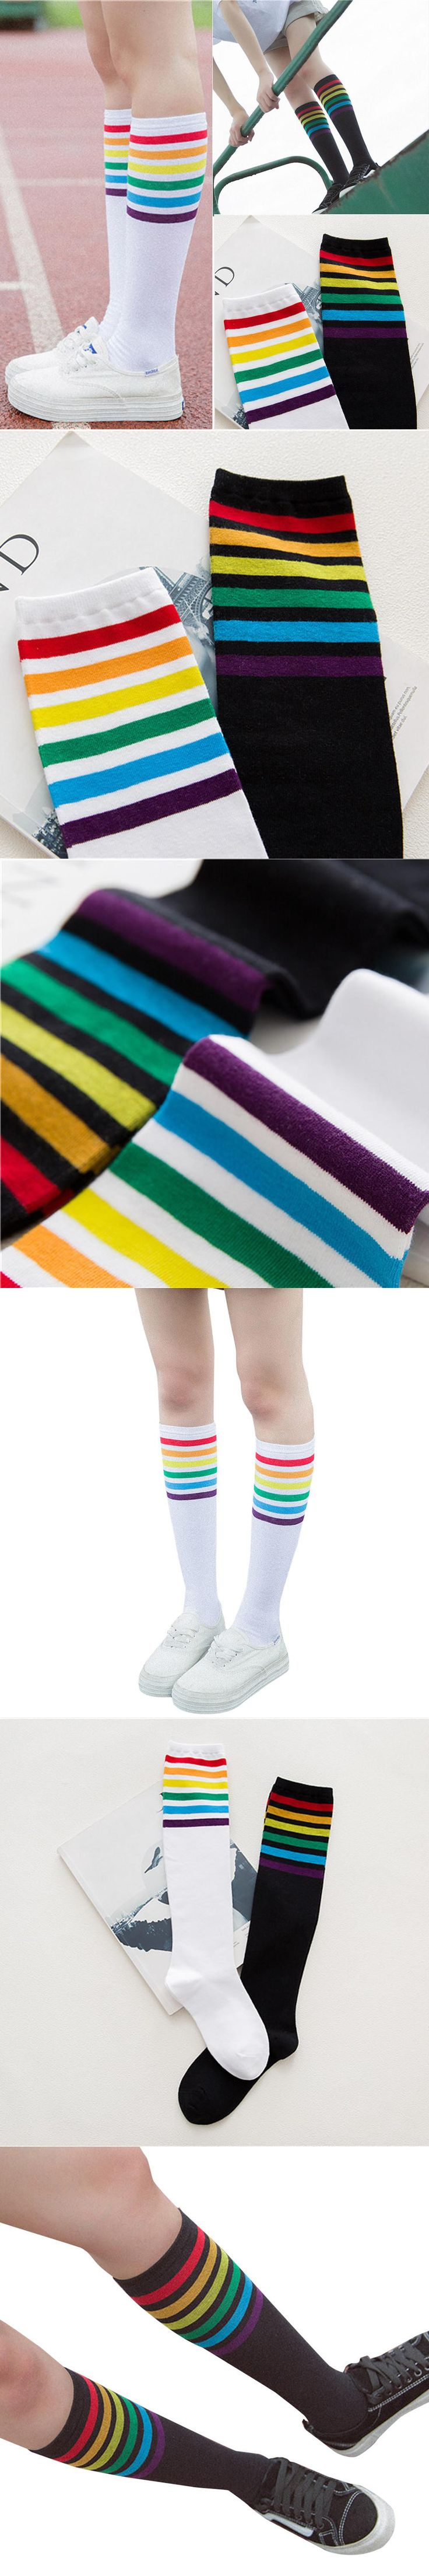 Feitong 1Pair Thigh High Socks Over Knee Rainbow Stripe Girls Wild Socks Black White Circulation Swelling Relief Foot Sleeve Hot